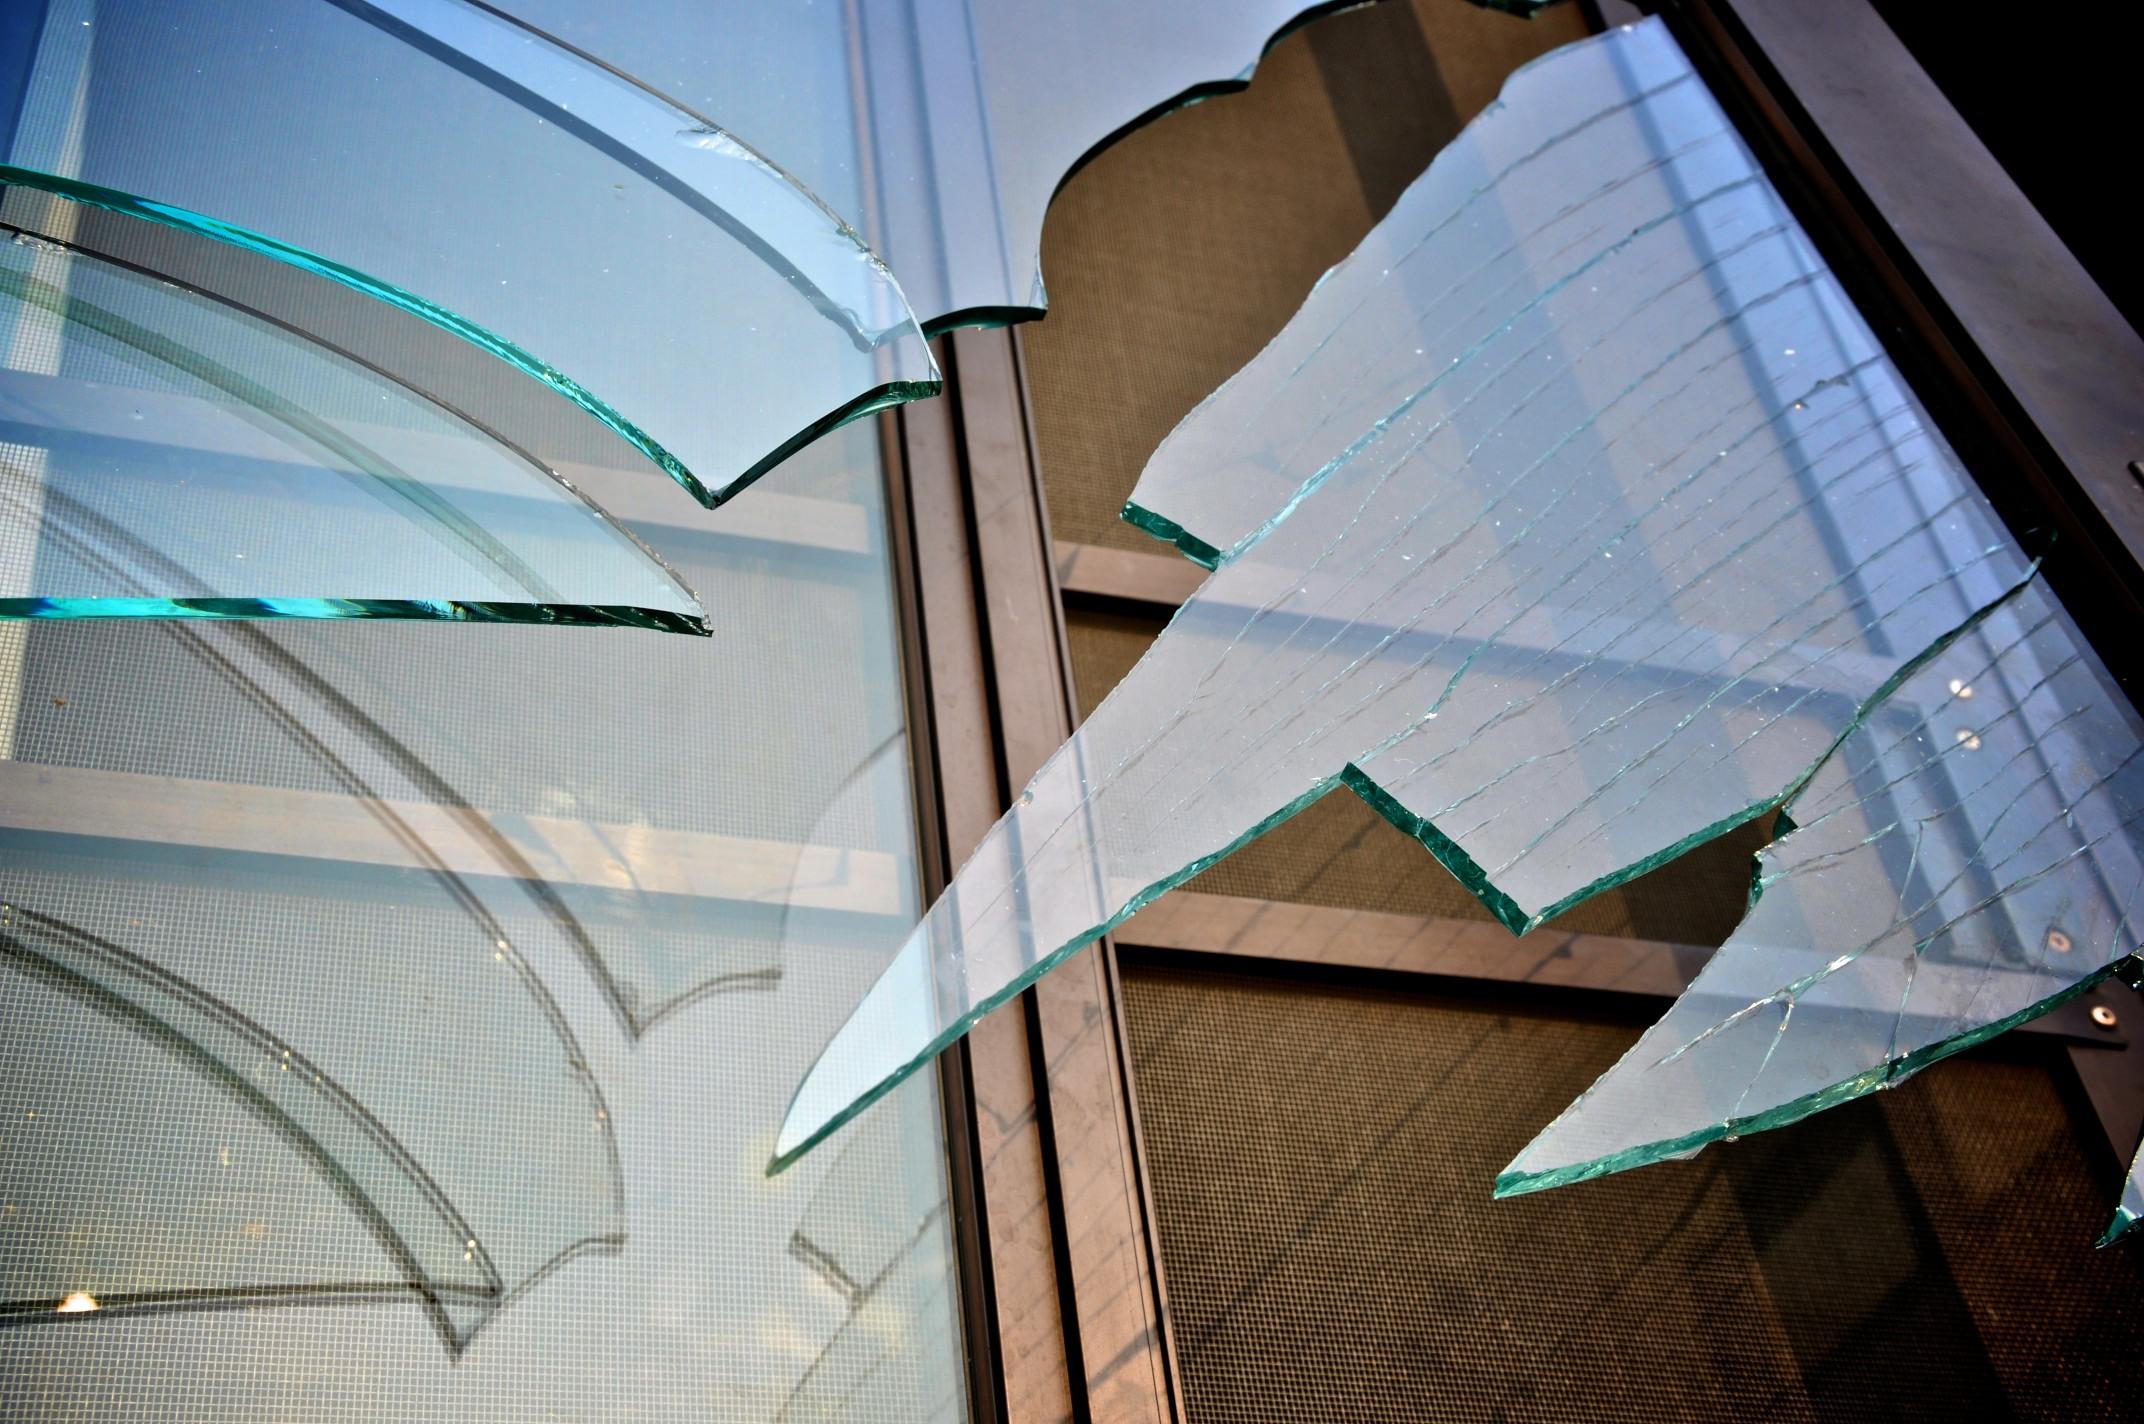 Glass Safety